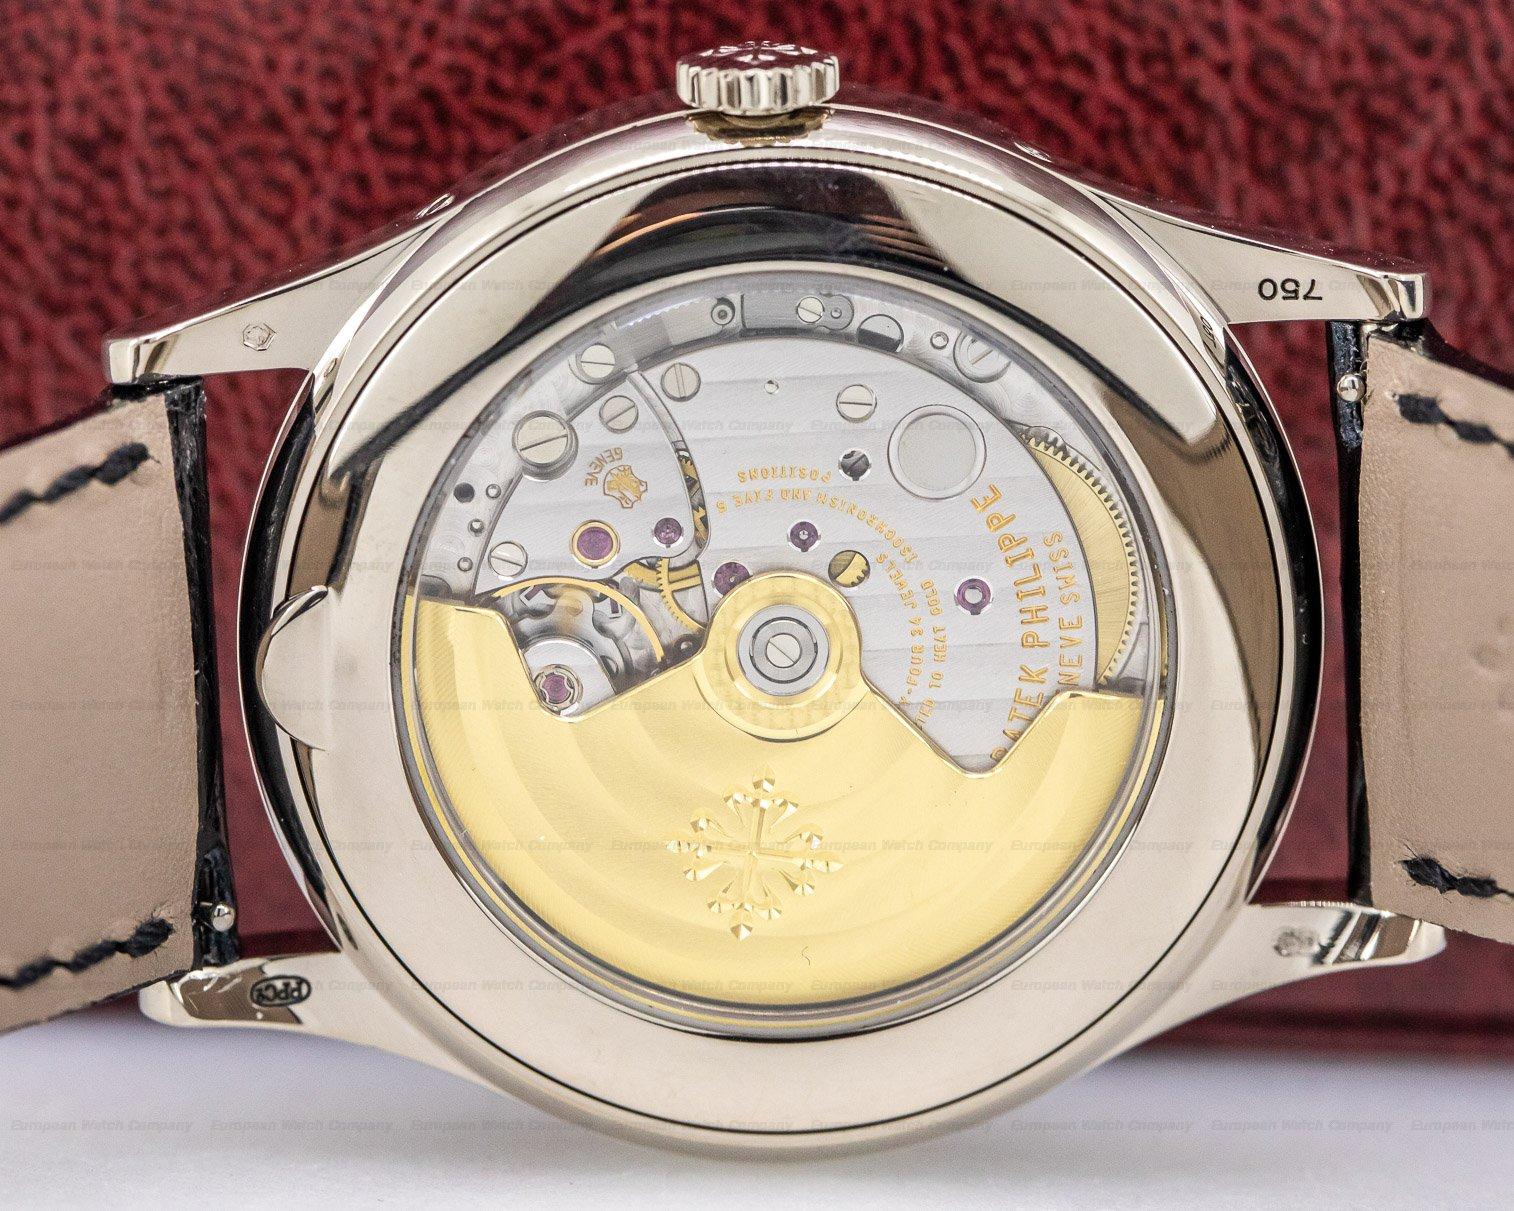 Patek Philippe 5396G-001 Annual Calendar Sector Dial 18K White Gold